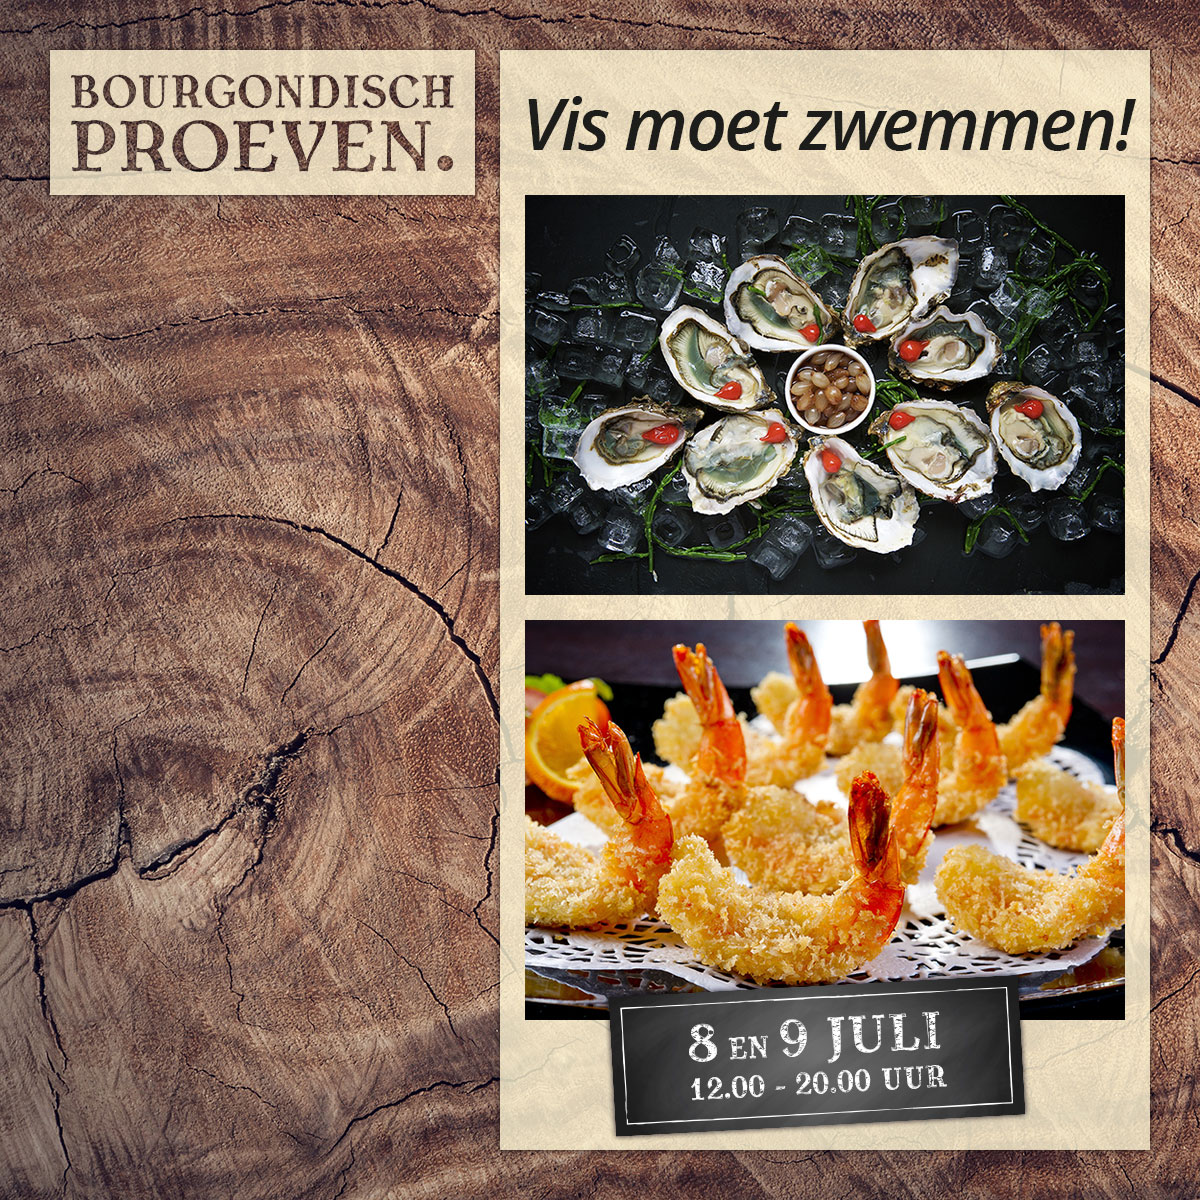 De Bourgondiër – Bourgondisch Proeven. – Facebookbericht – Vis-moet-zwemmen